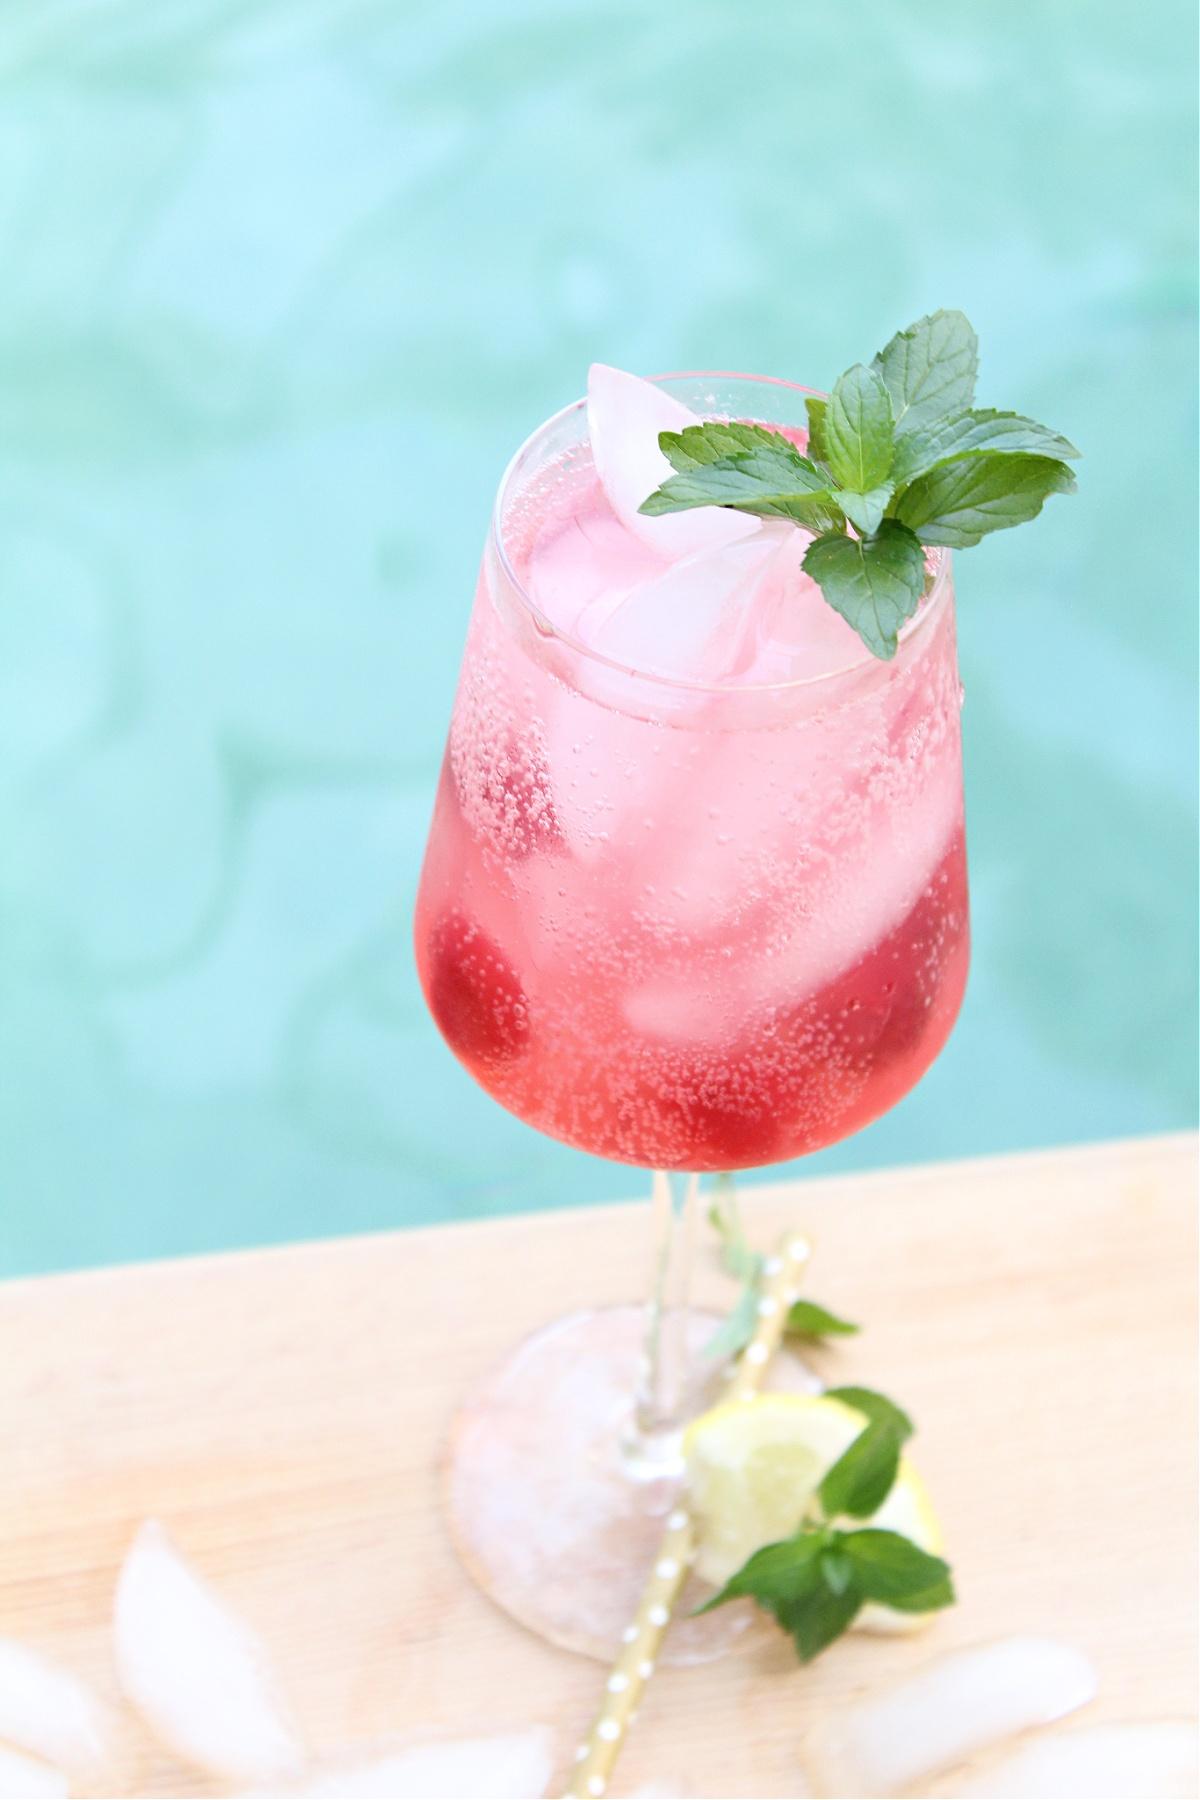 Best Cherry Lemonade Vodka Cocktail